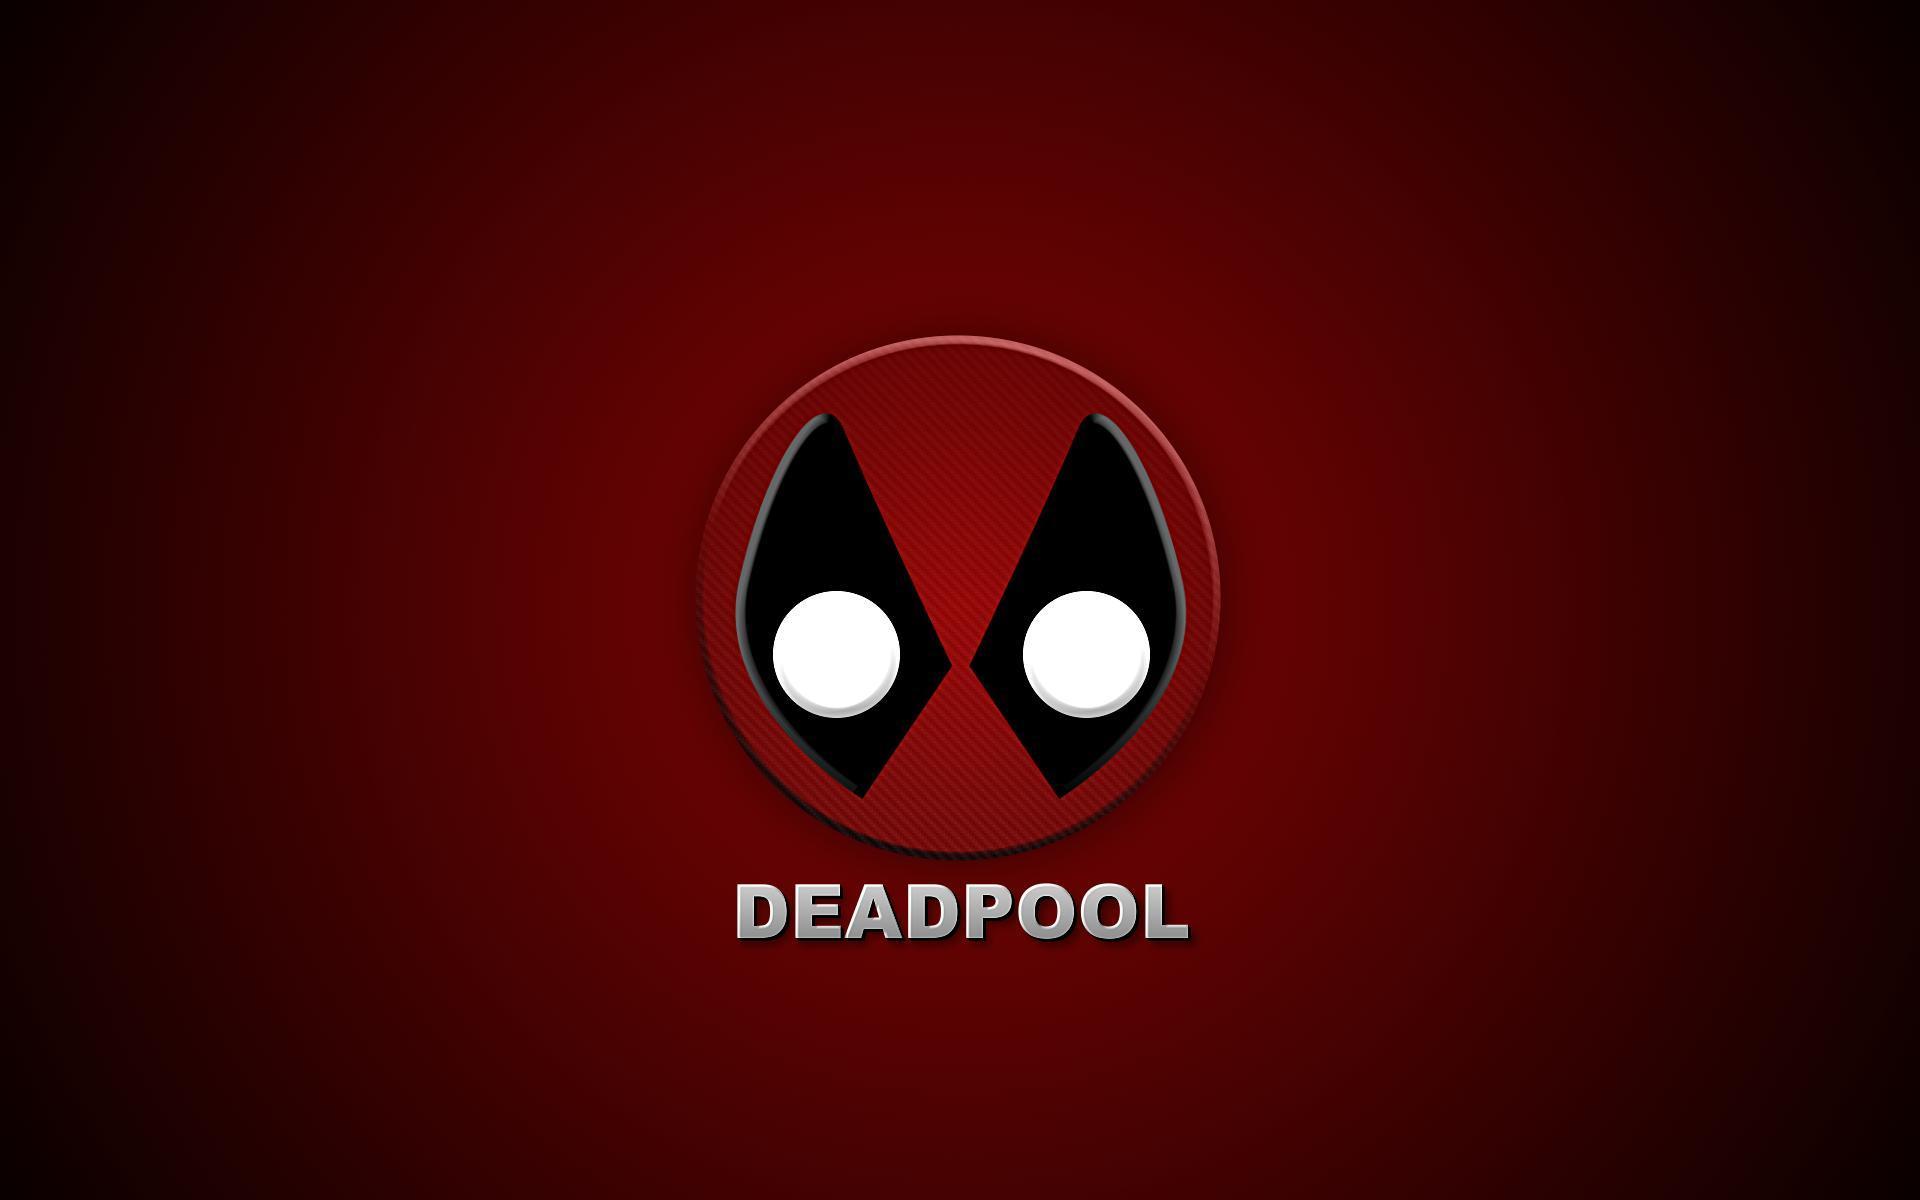 Cute Deadpool Wallpapers Top Free Cute Deadpool Backgrounds